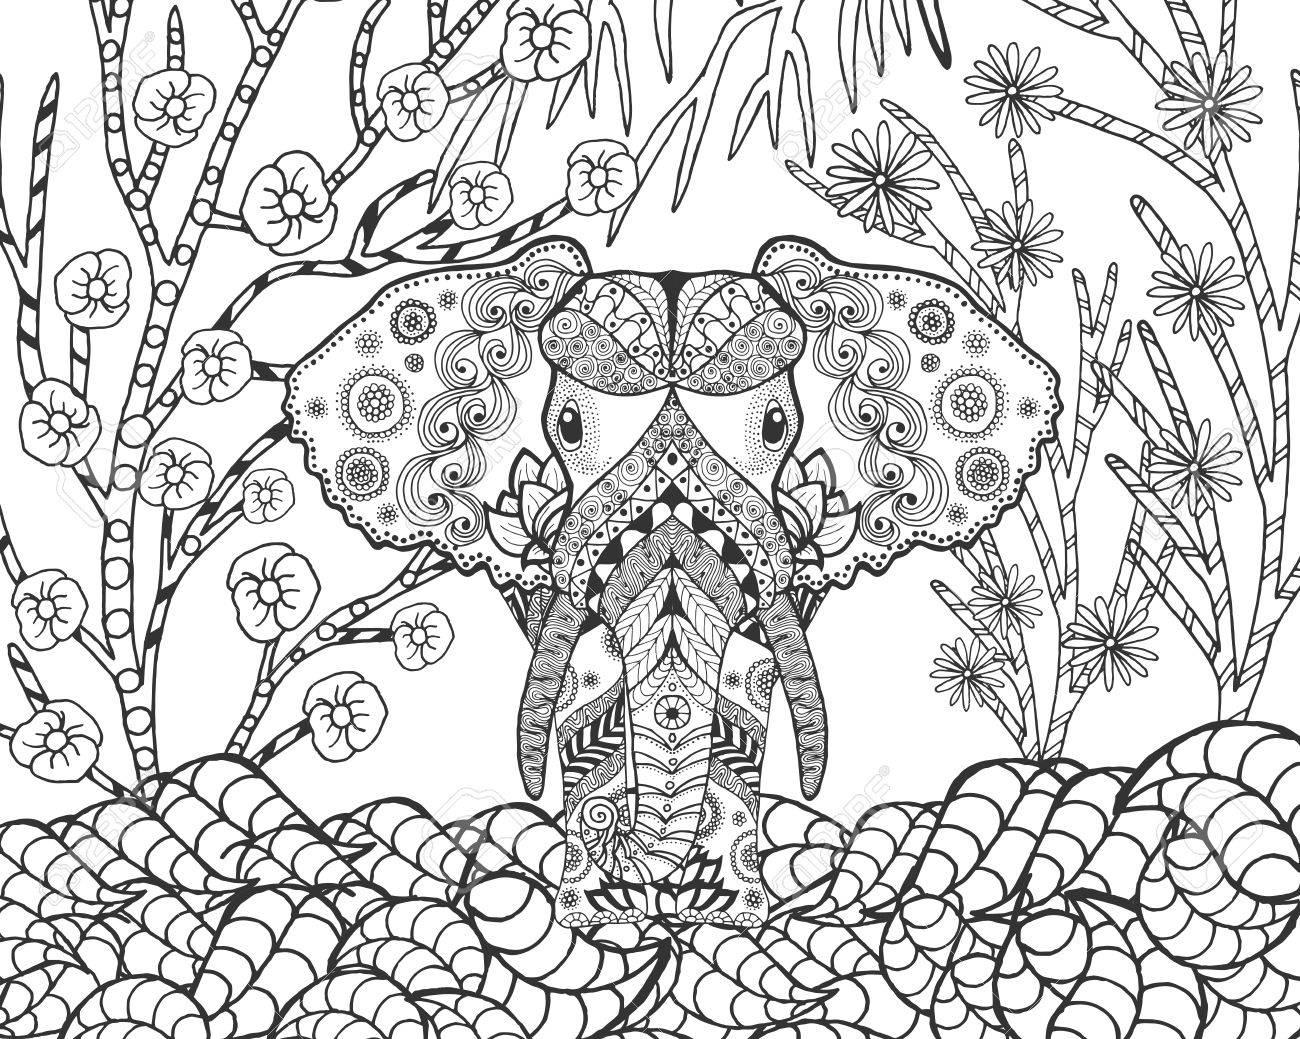 Astounding Fantasy Garden Animals Doodle Ethnic Patterned Illustration African Indian Tote Fantasy Garden Design 52882237 Elephant garden Fantasy Garden Designs